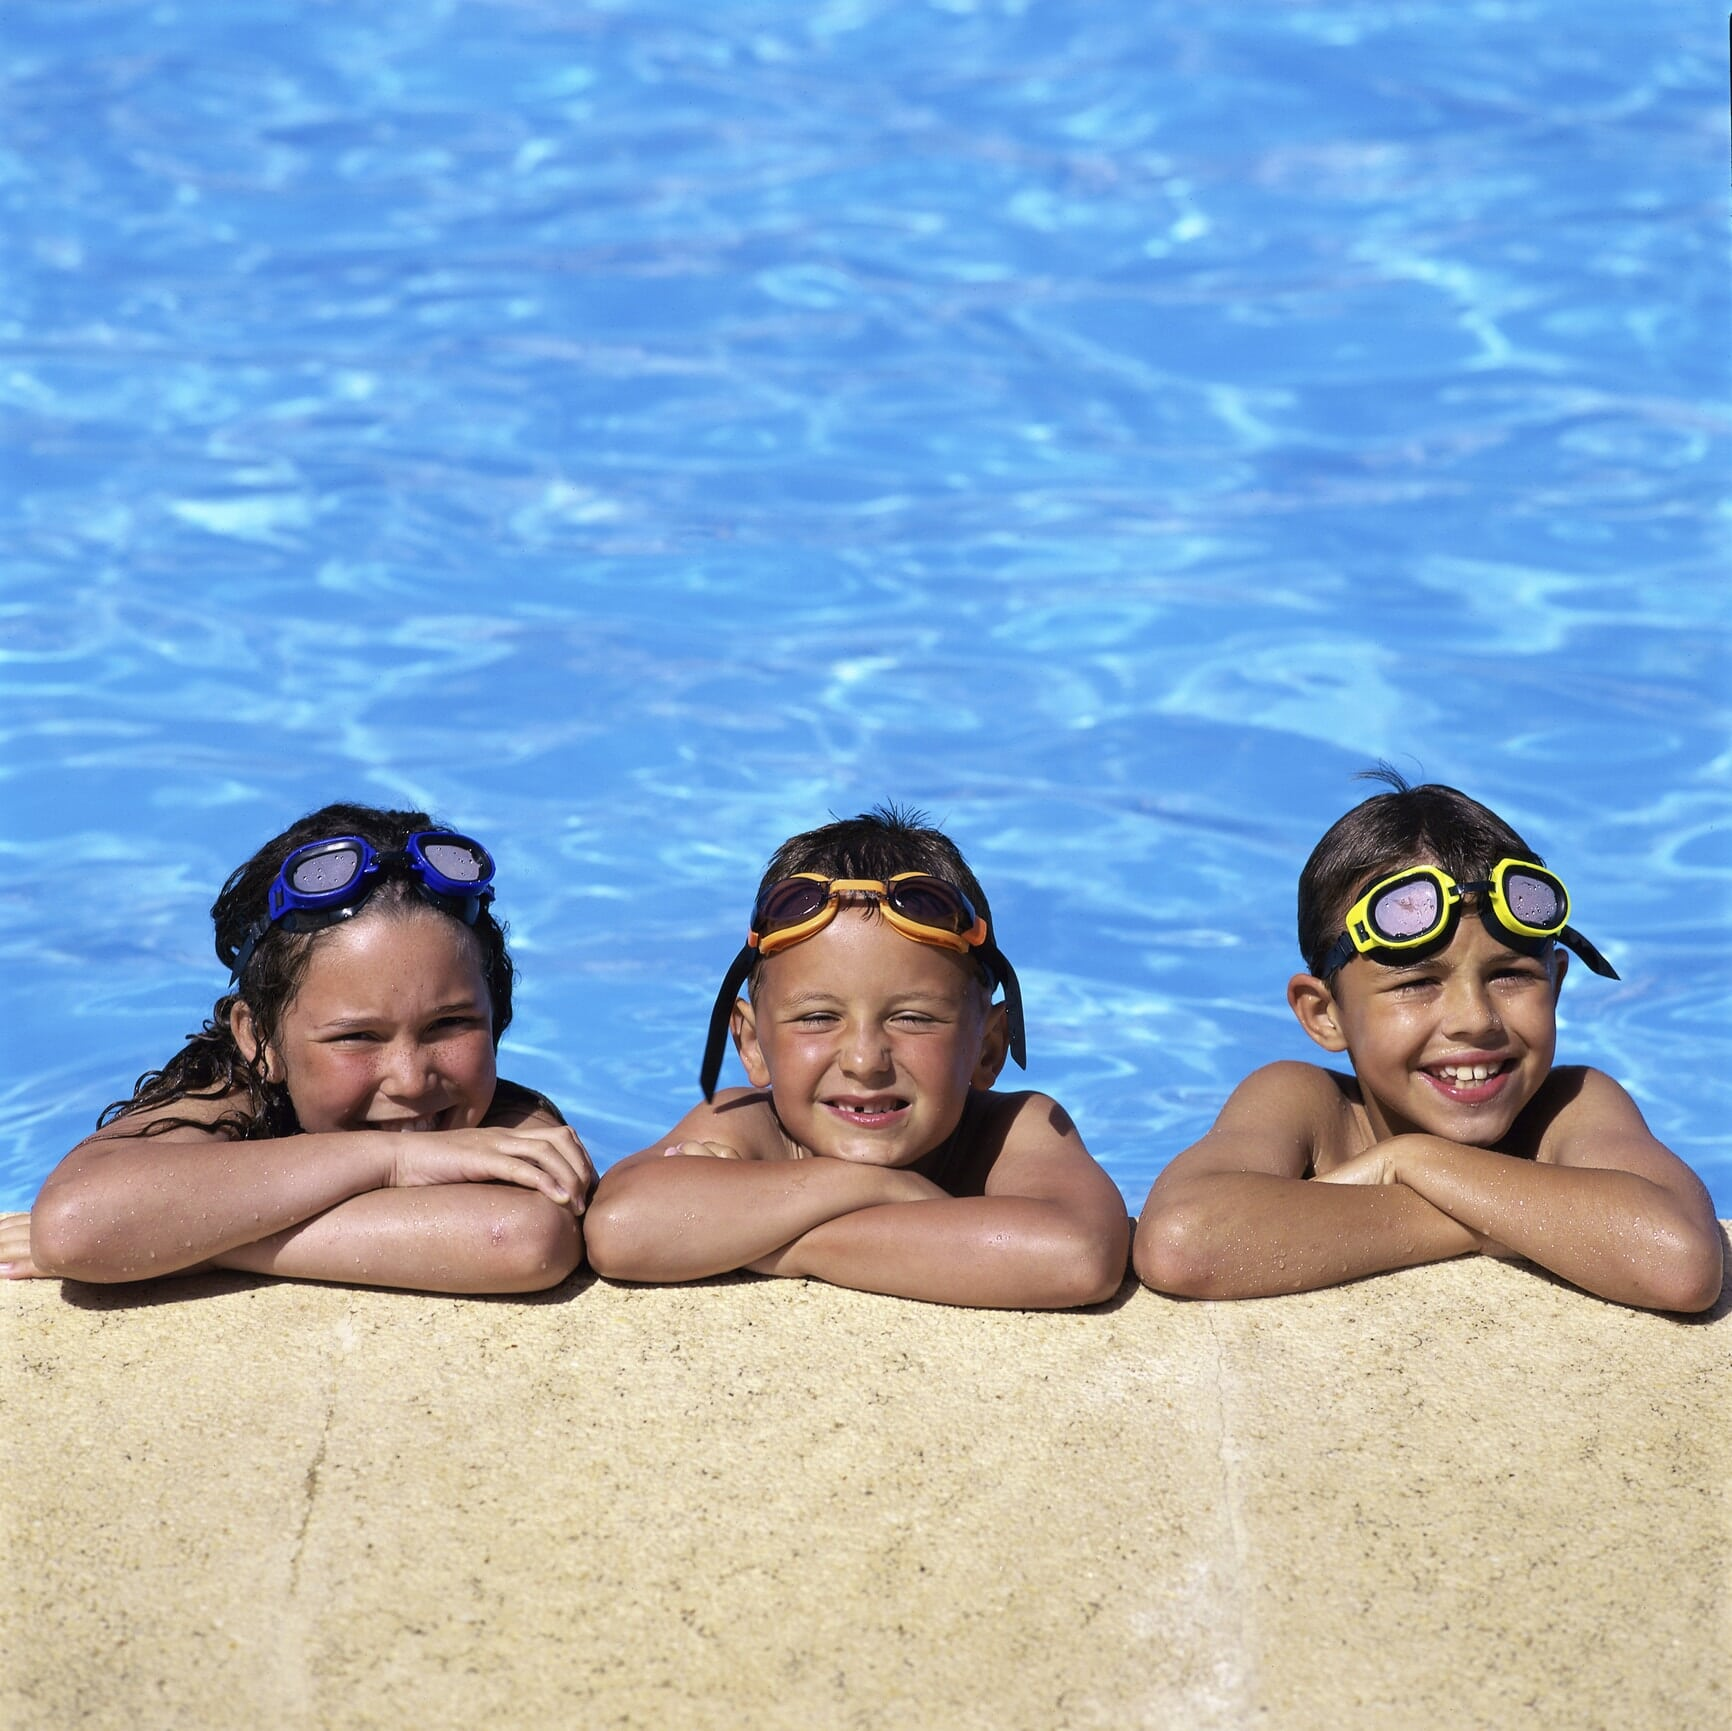 Paradise Pools and Spas of Illinois, Inc. image 4